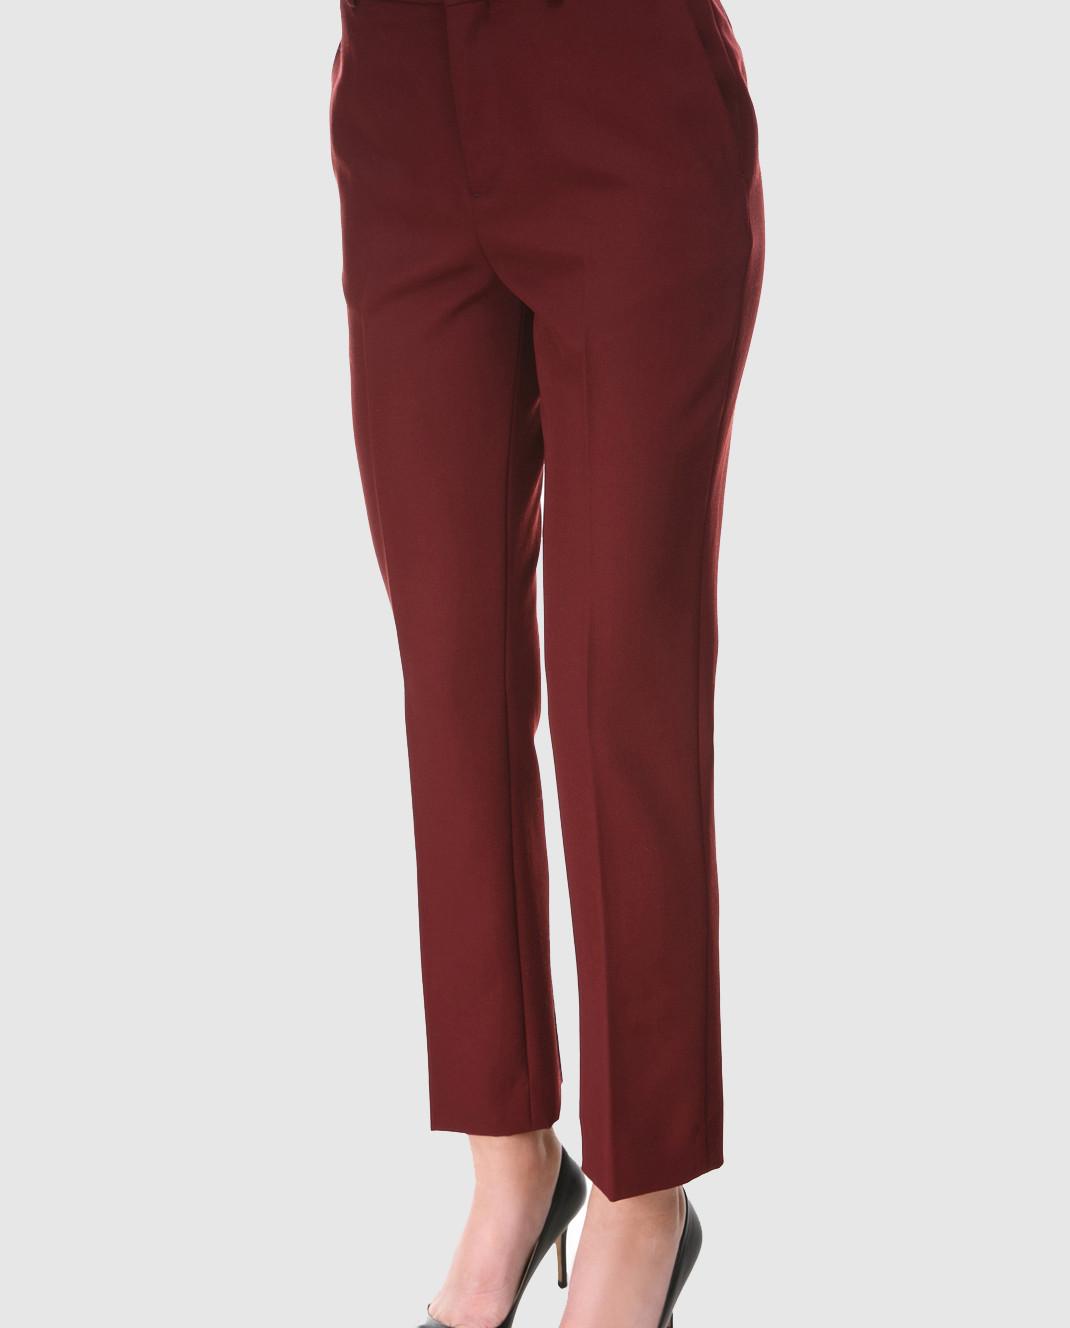 Victoria by Victoria Beckham Бордовые брюки из шерсти TRVV085B изображение 3